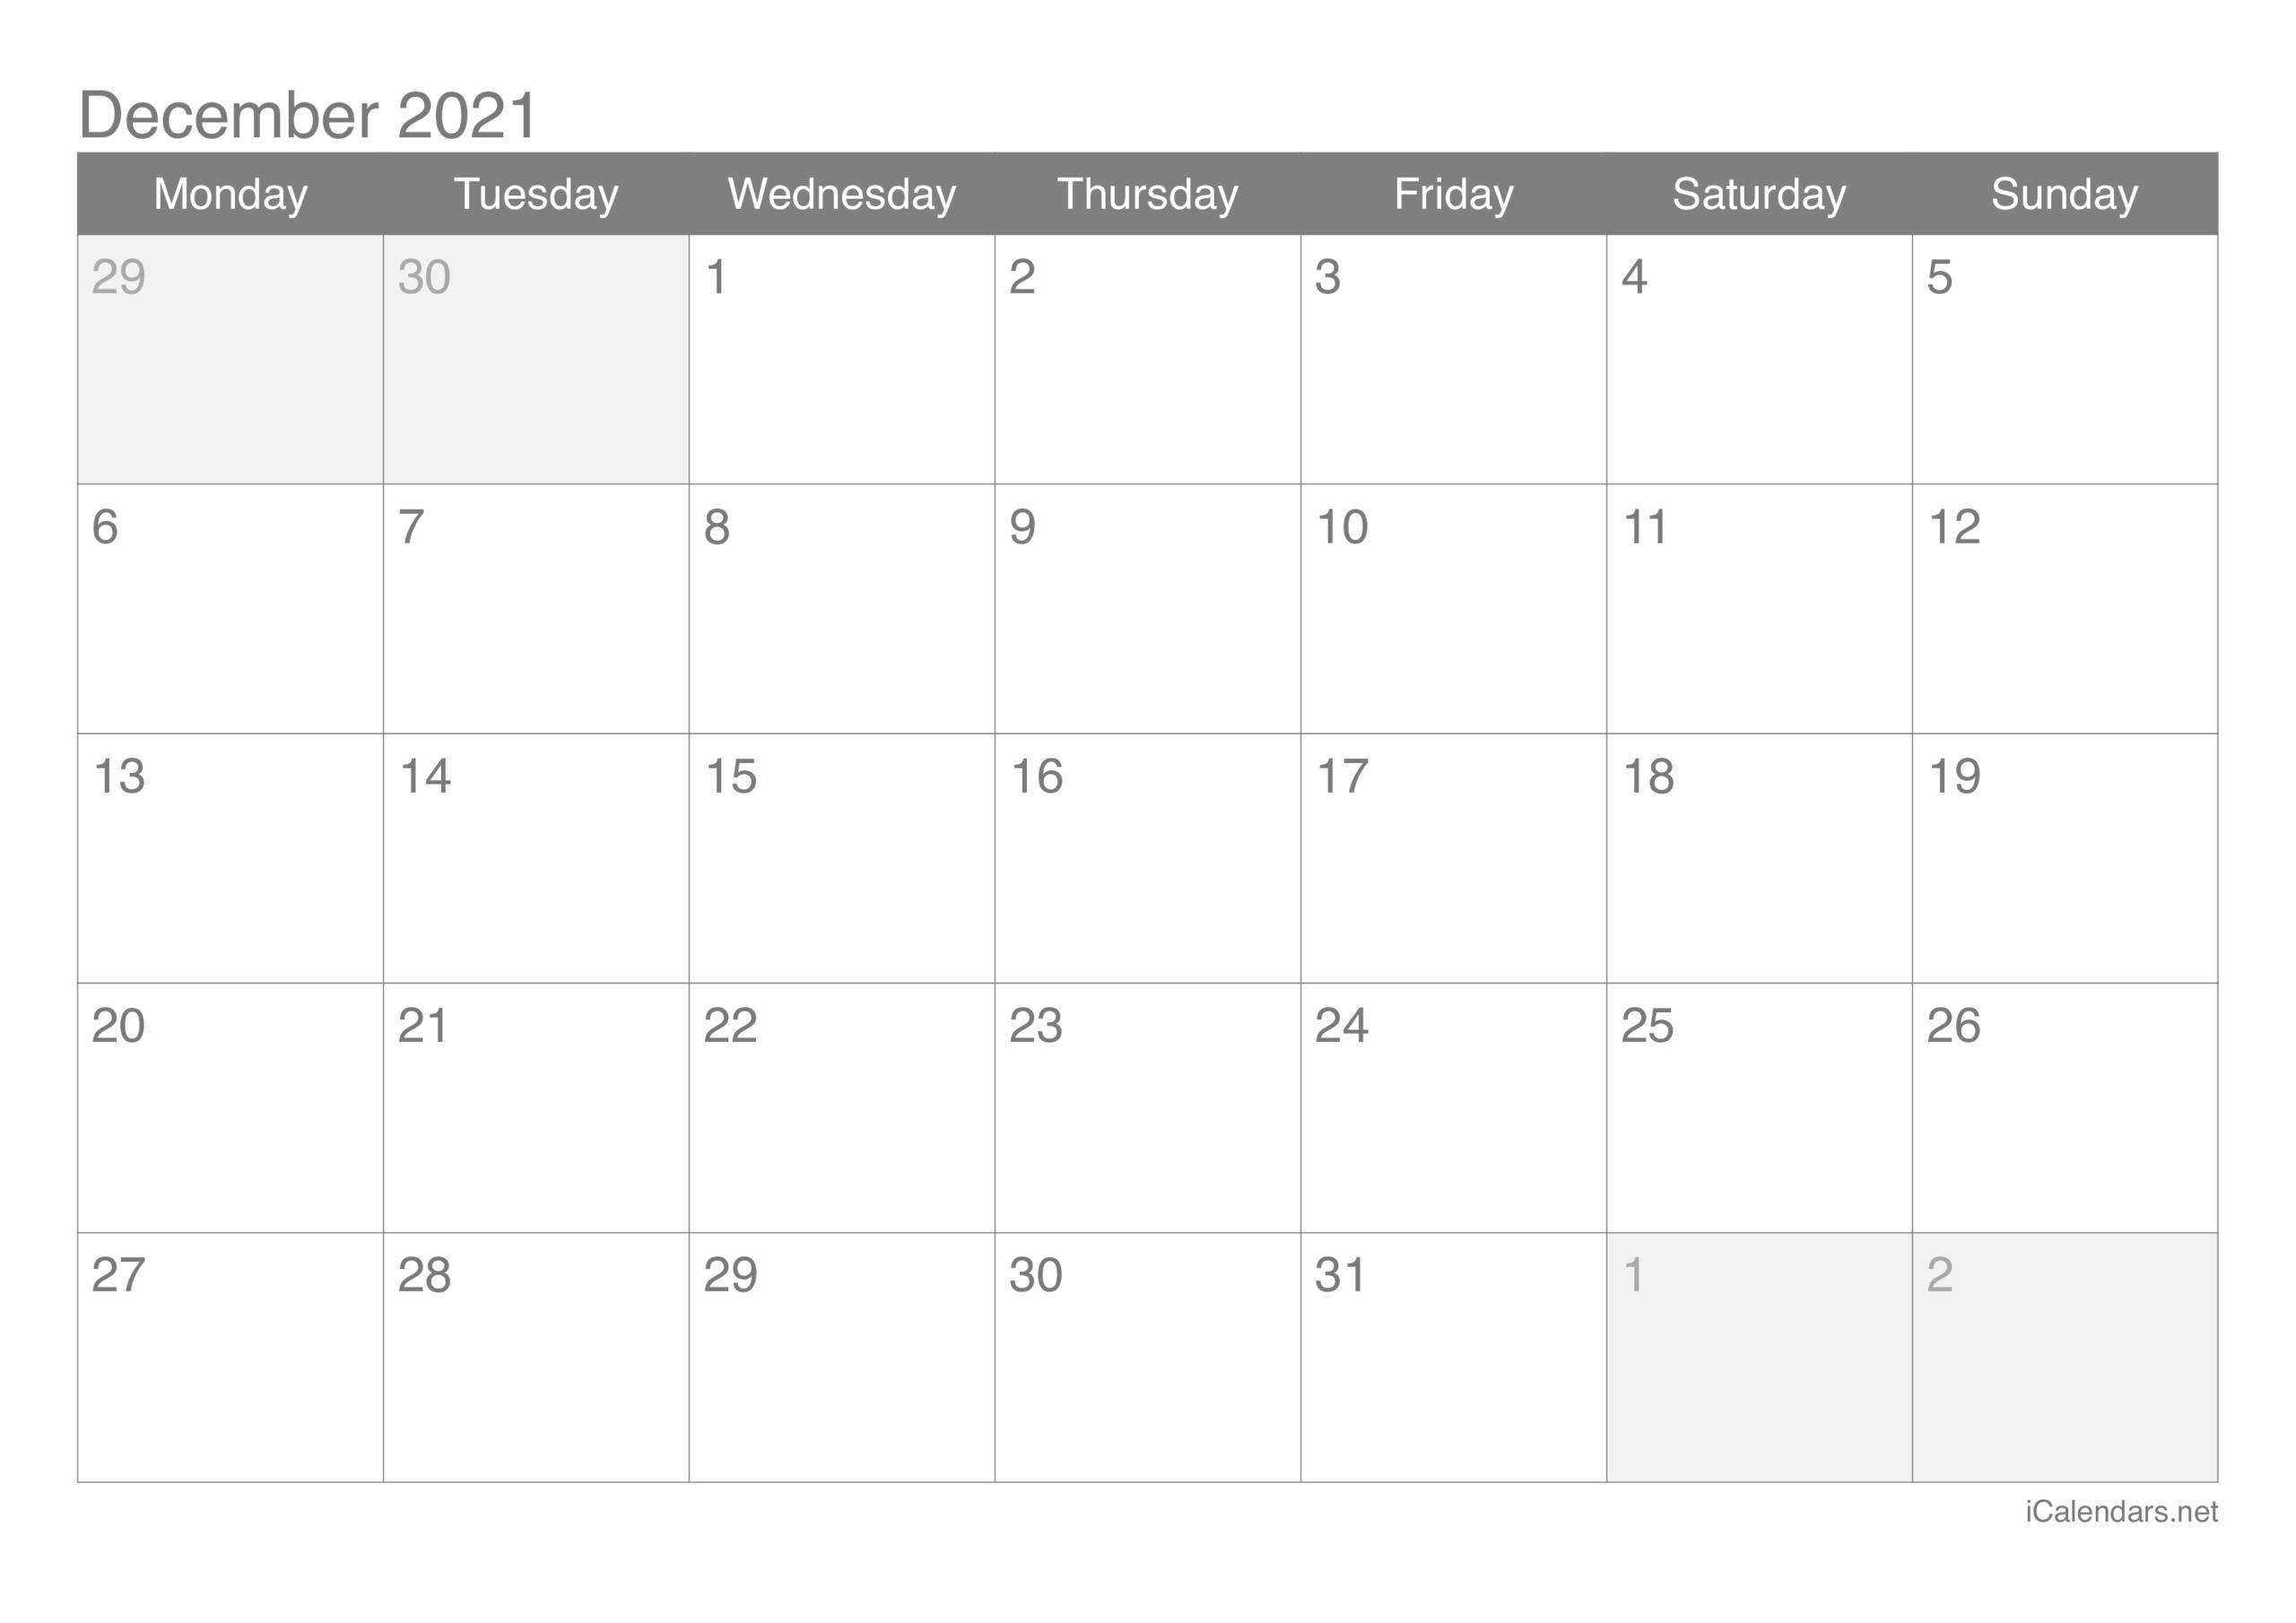 December 2021 Printable Calendar - Icalendars